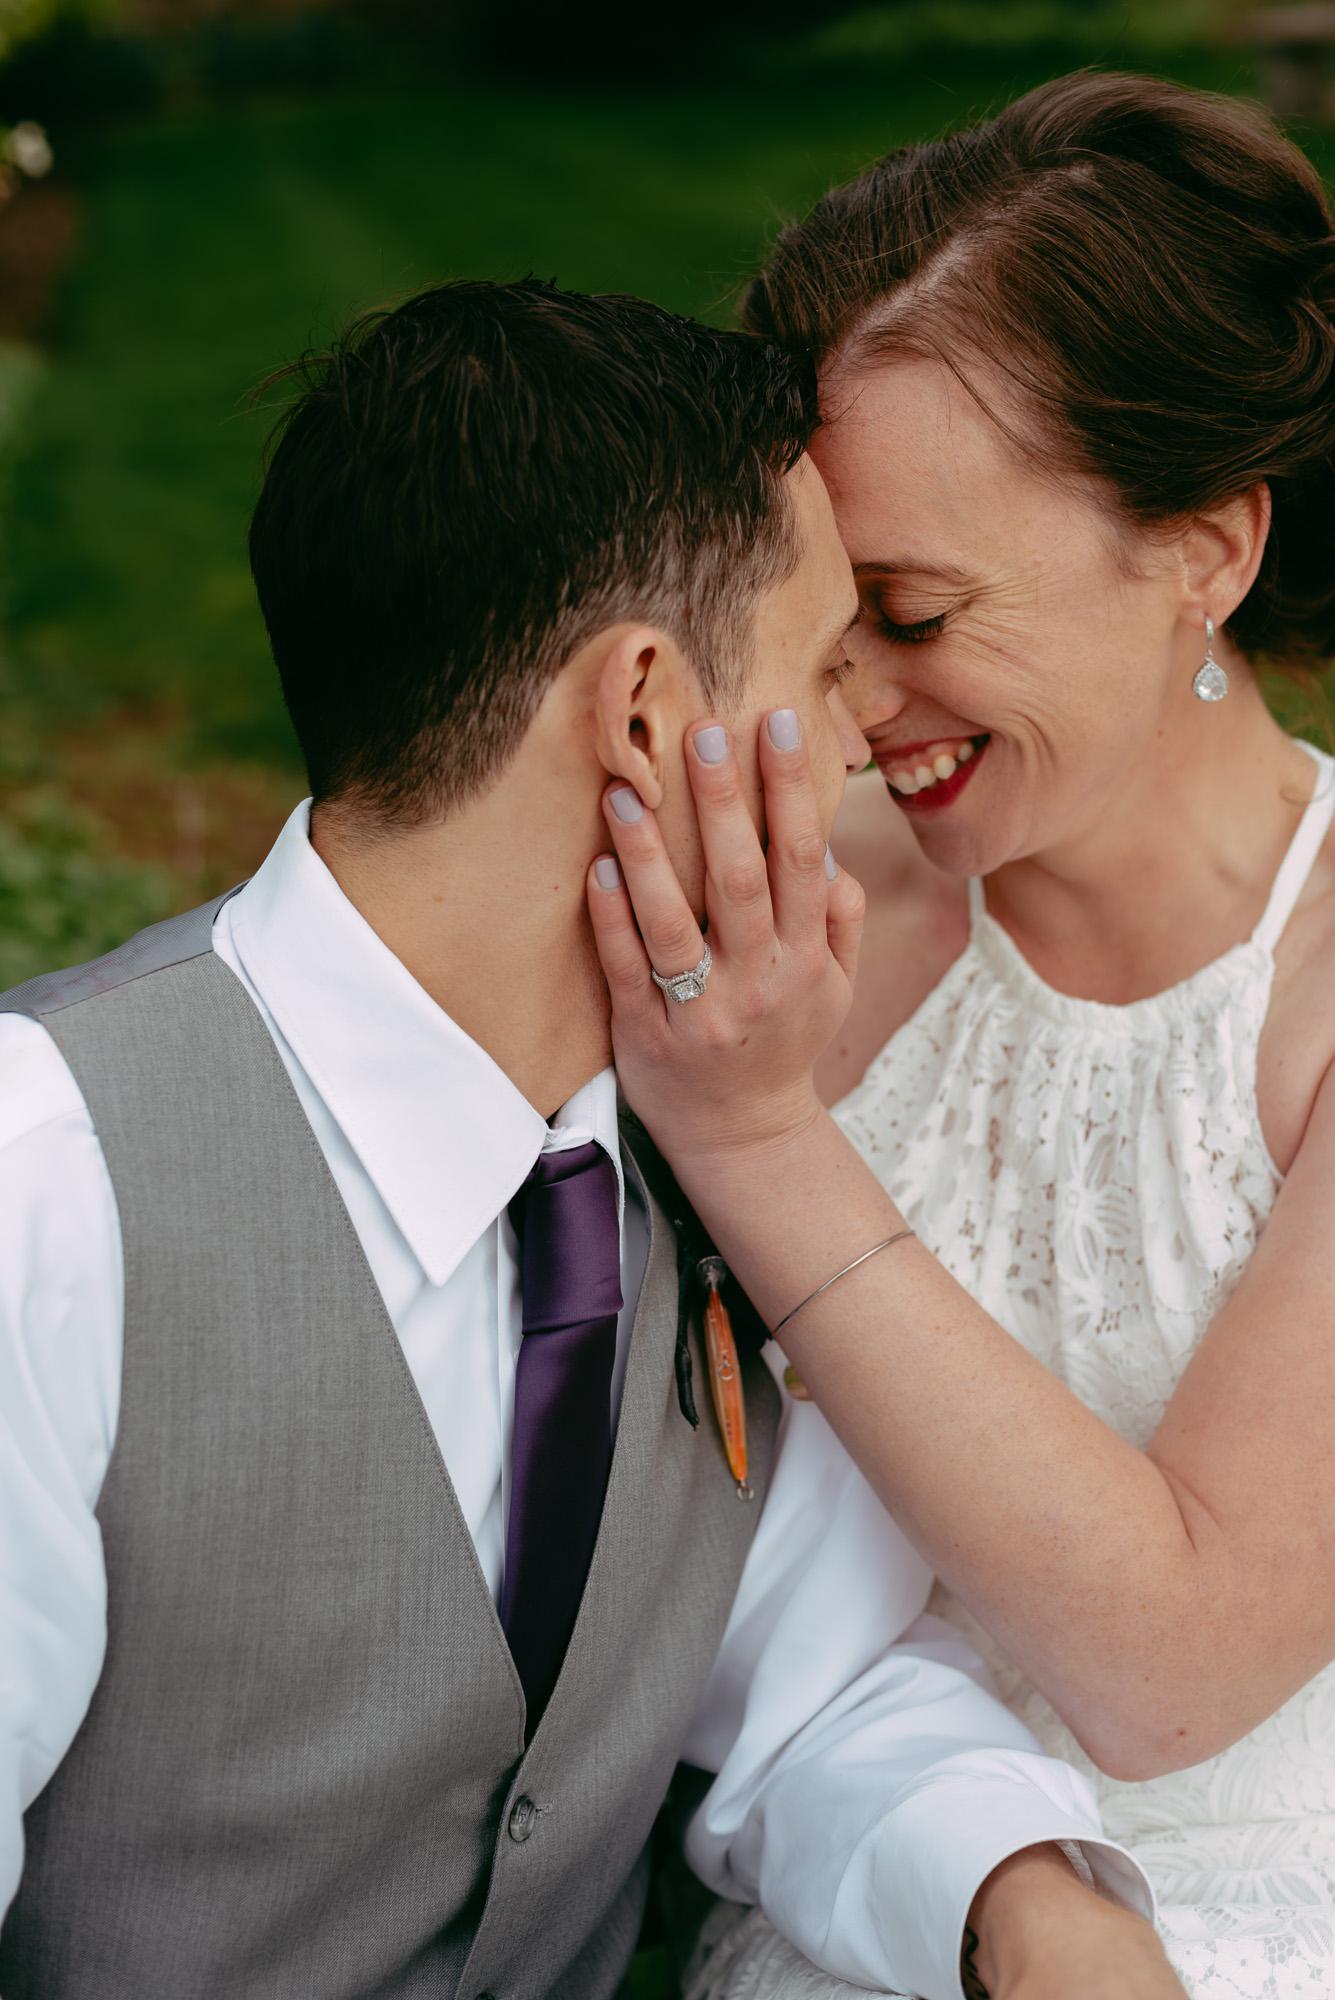 prairie-street-brewhouse-wedding-Rockford-IL-wedding-photographers-217.jpg